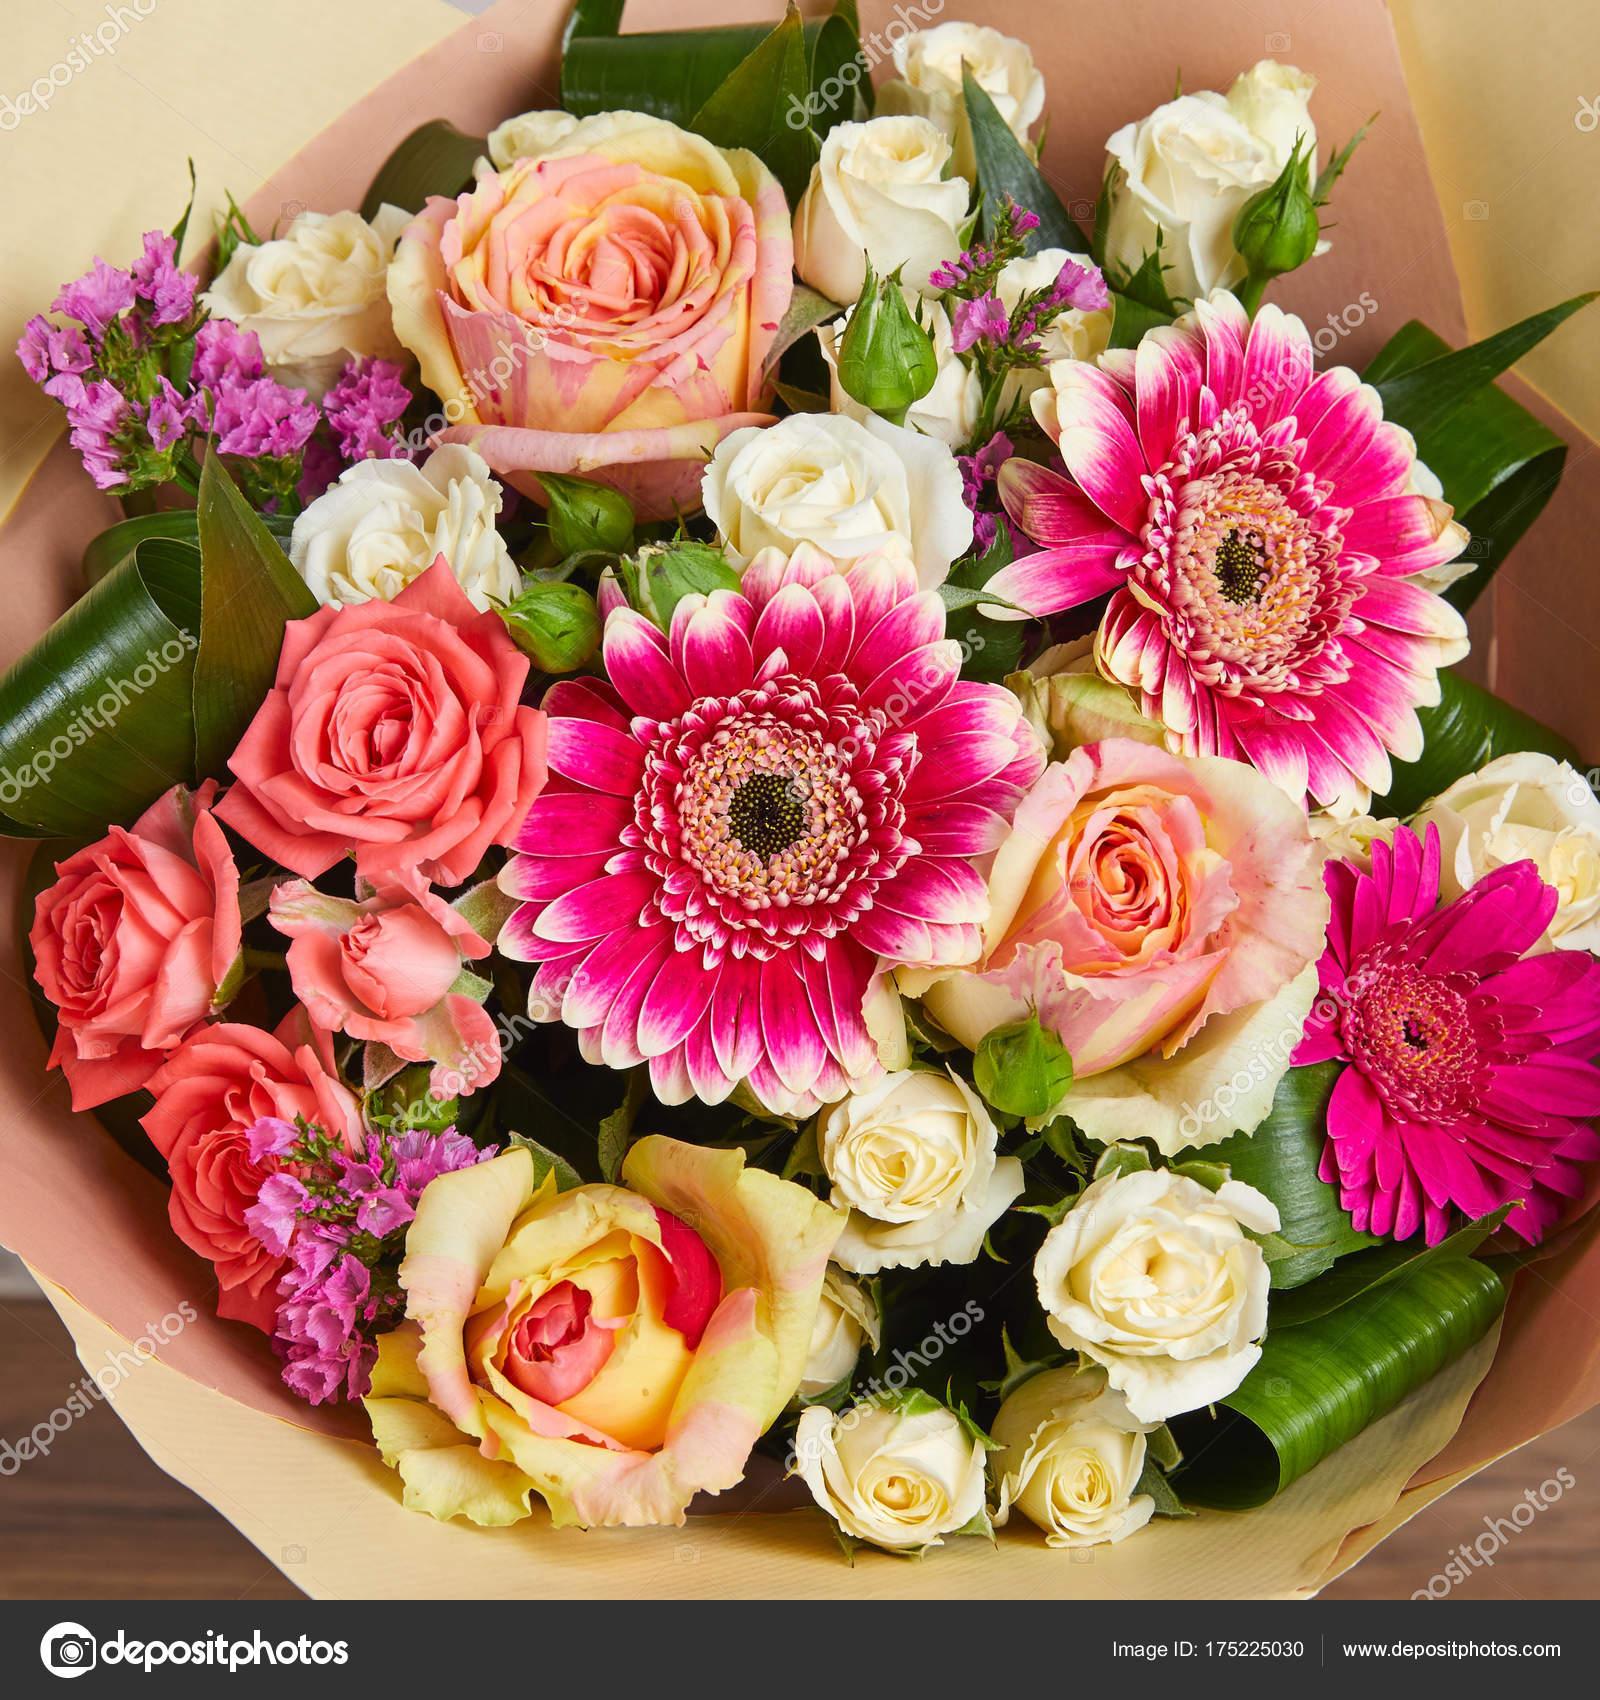 dress - Flowers Nice bouquet video